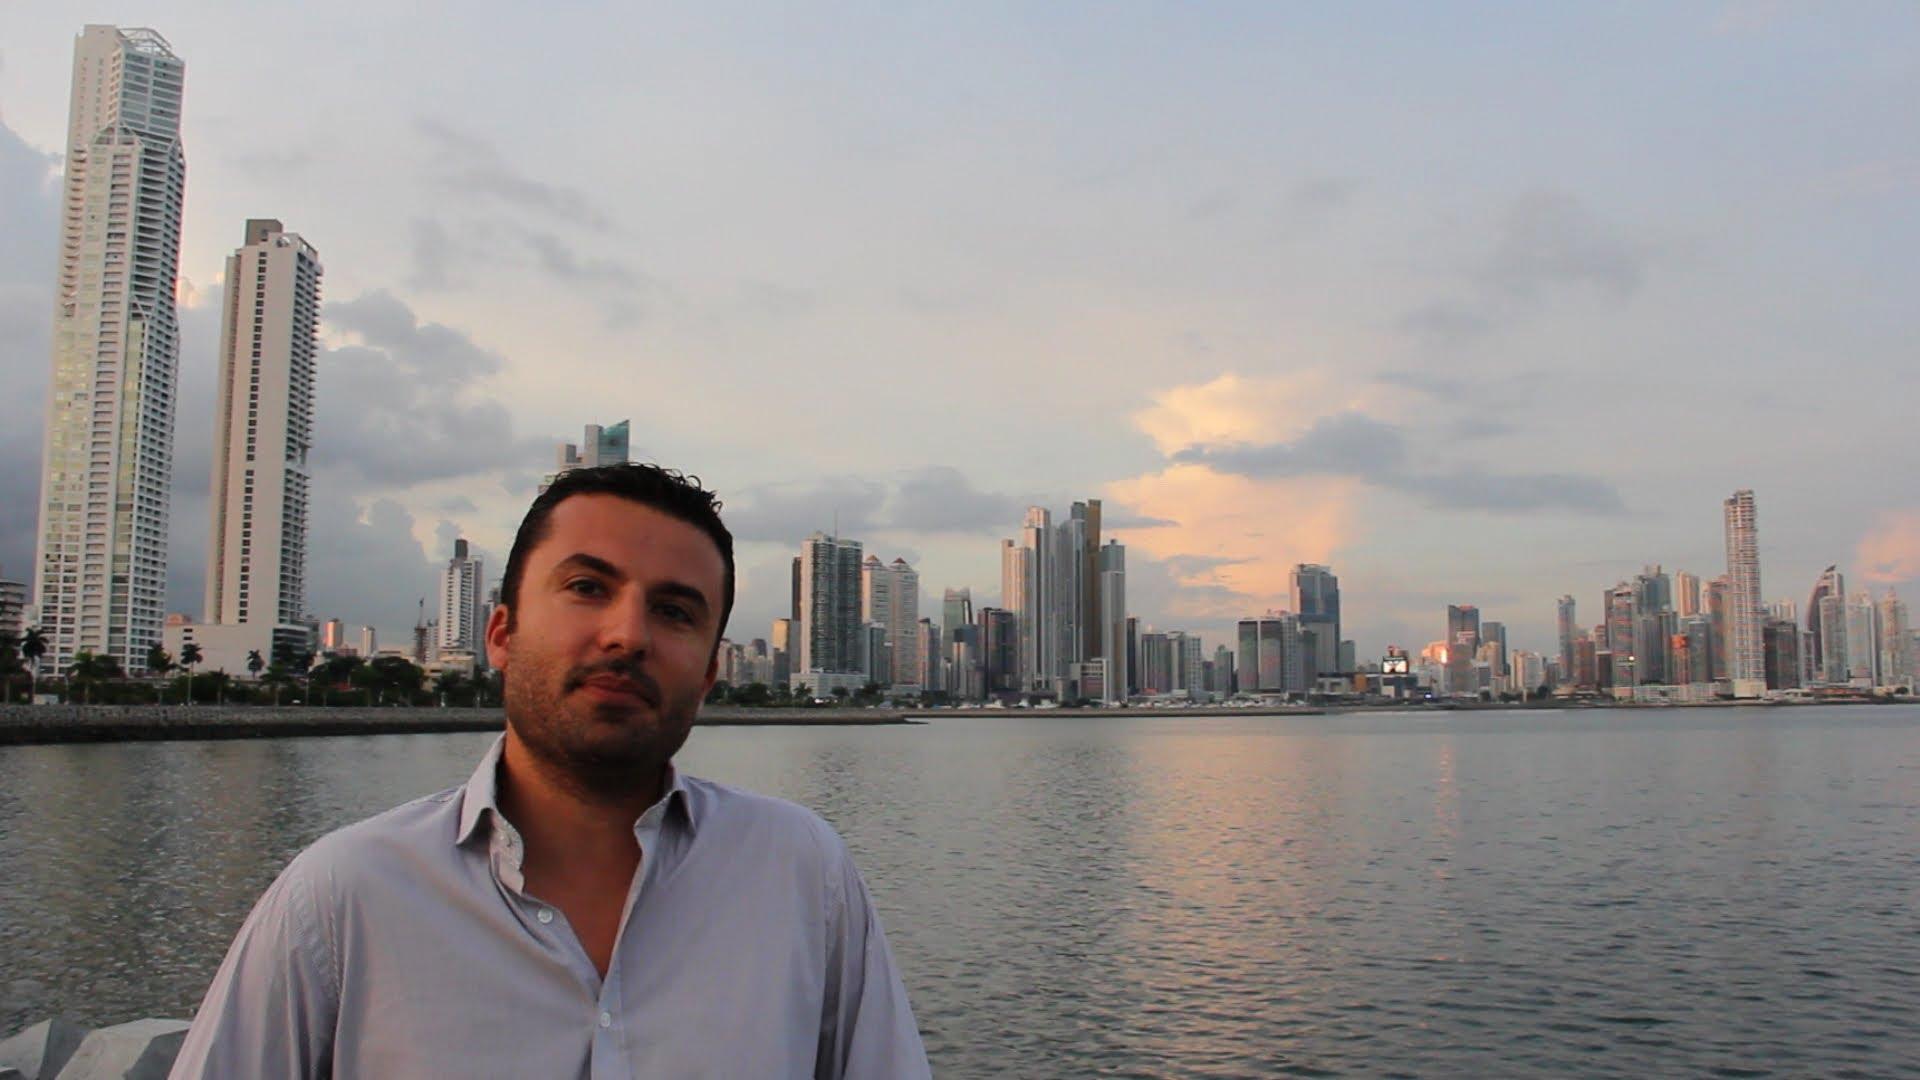 Alessandro Vetturini Panama america latina